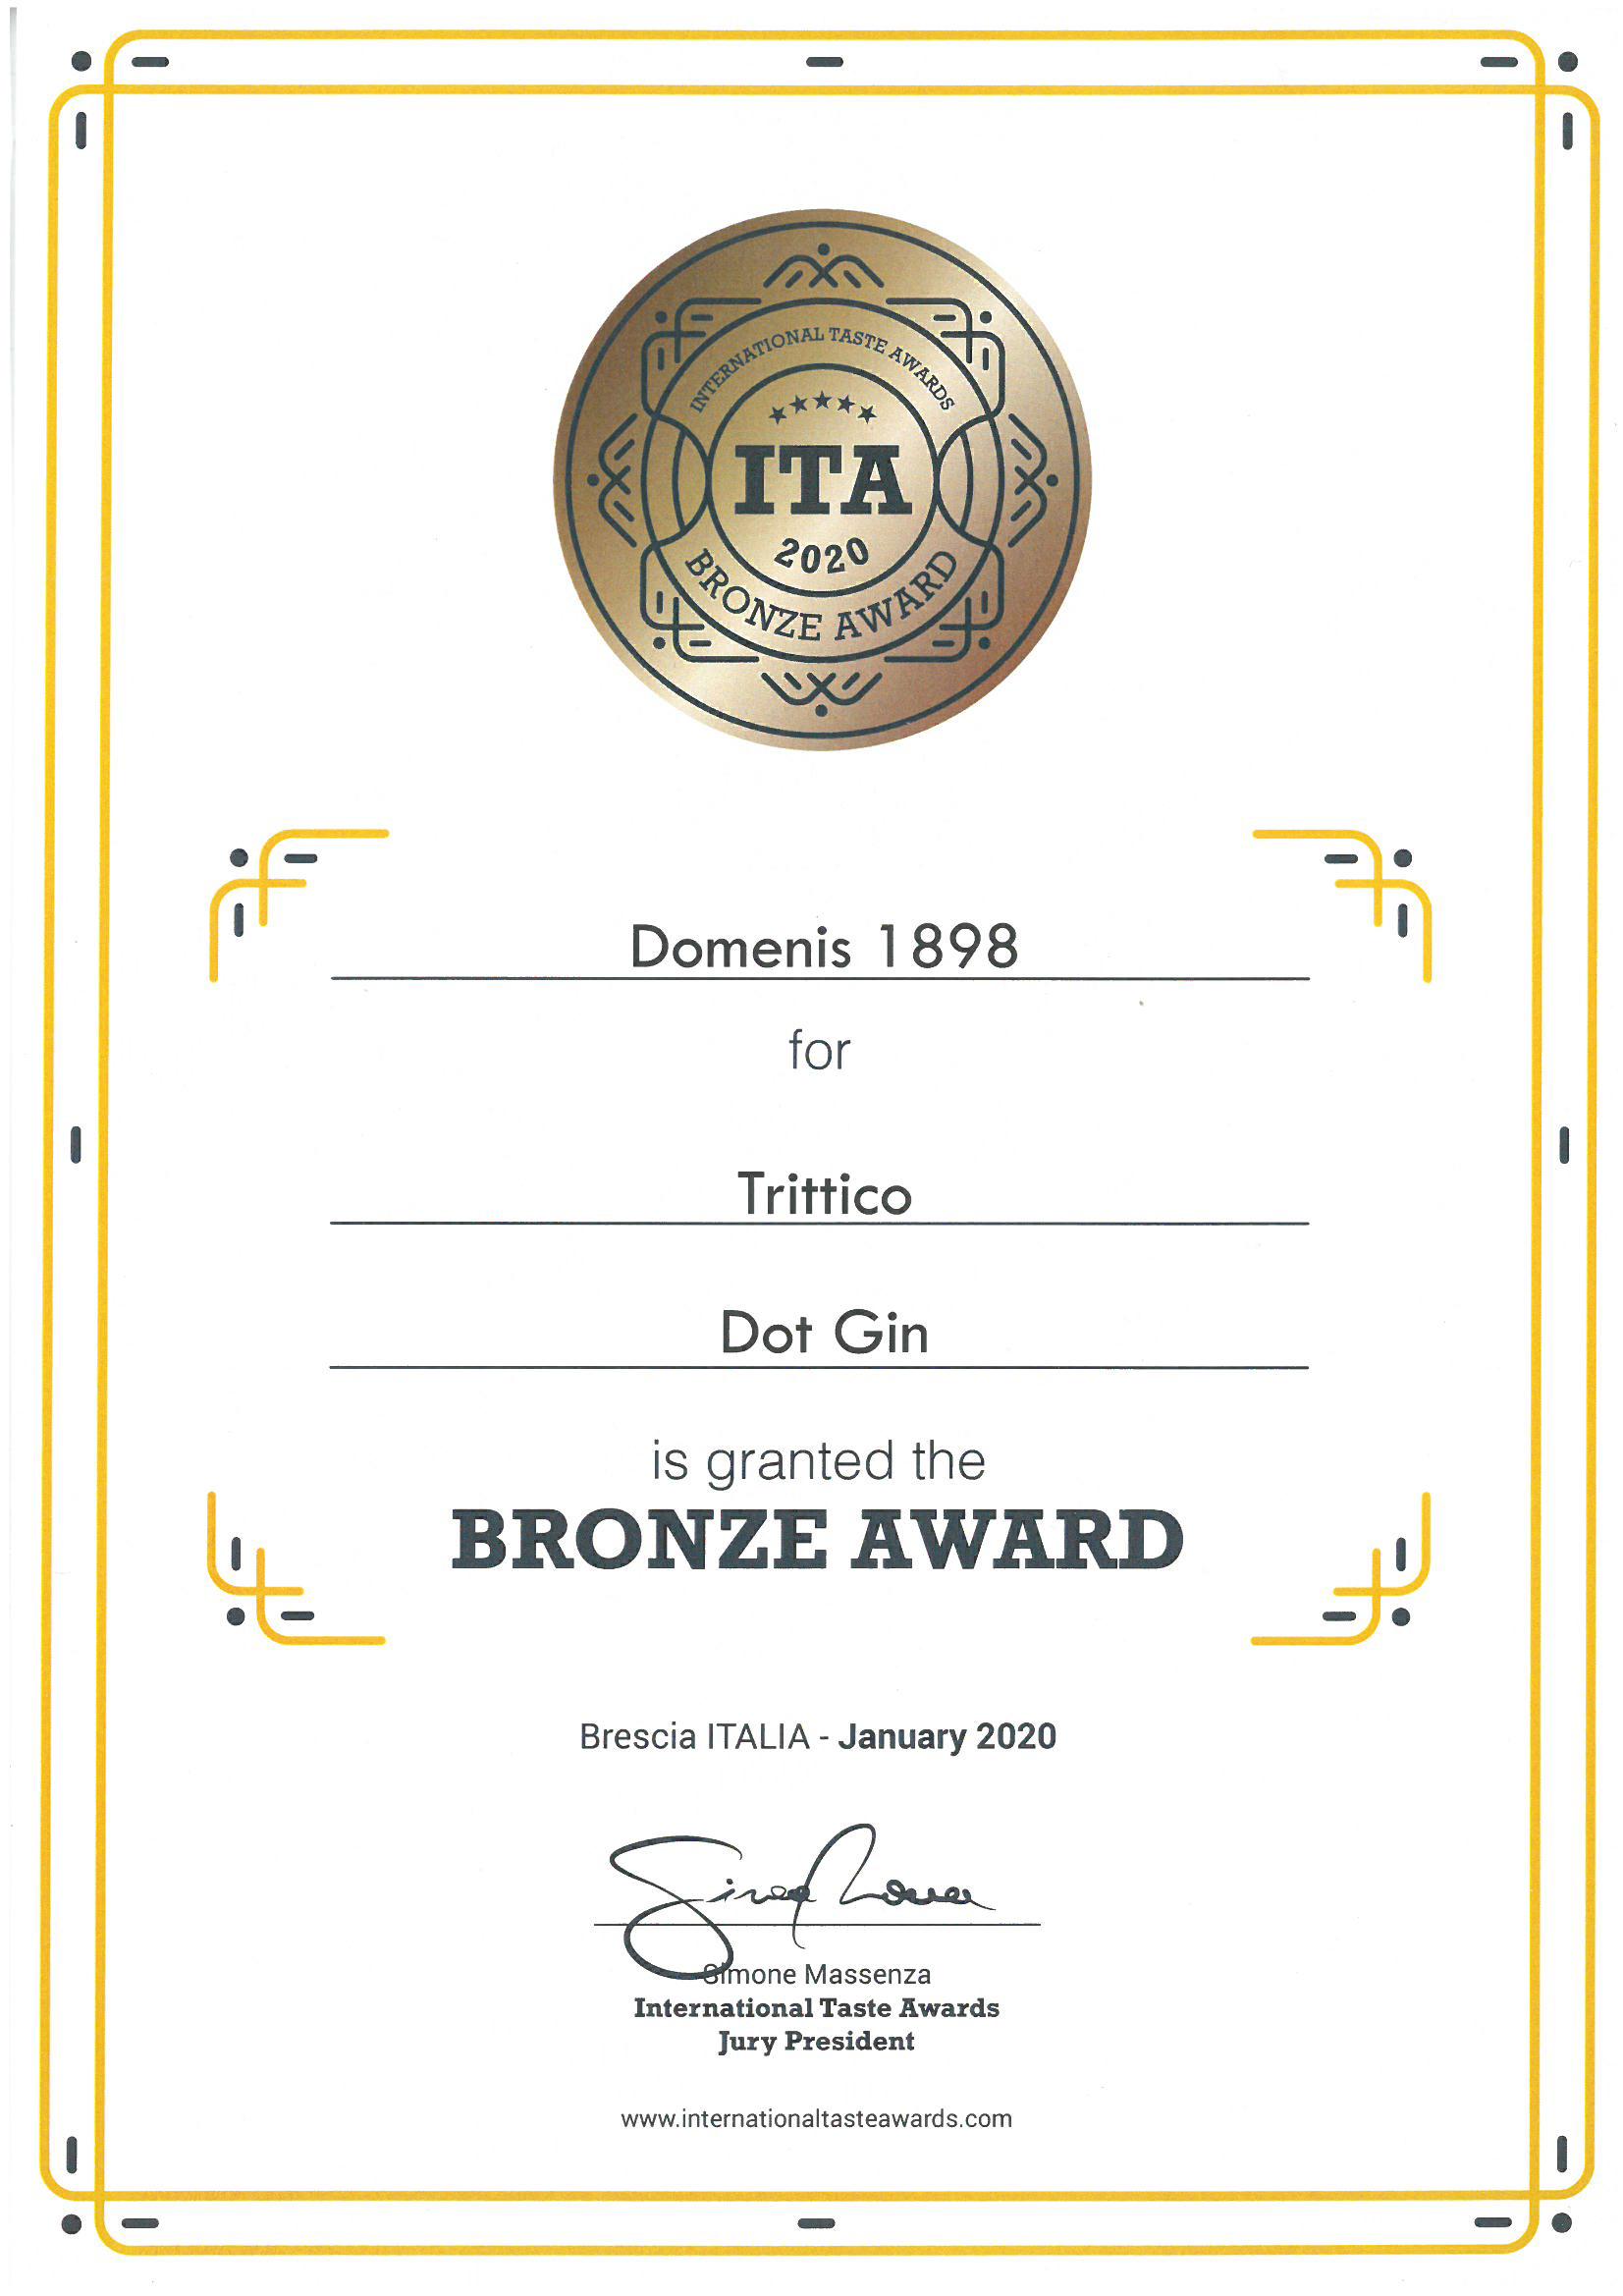 International Taste Awards 2020 – TRITTICO Dot Gin